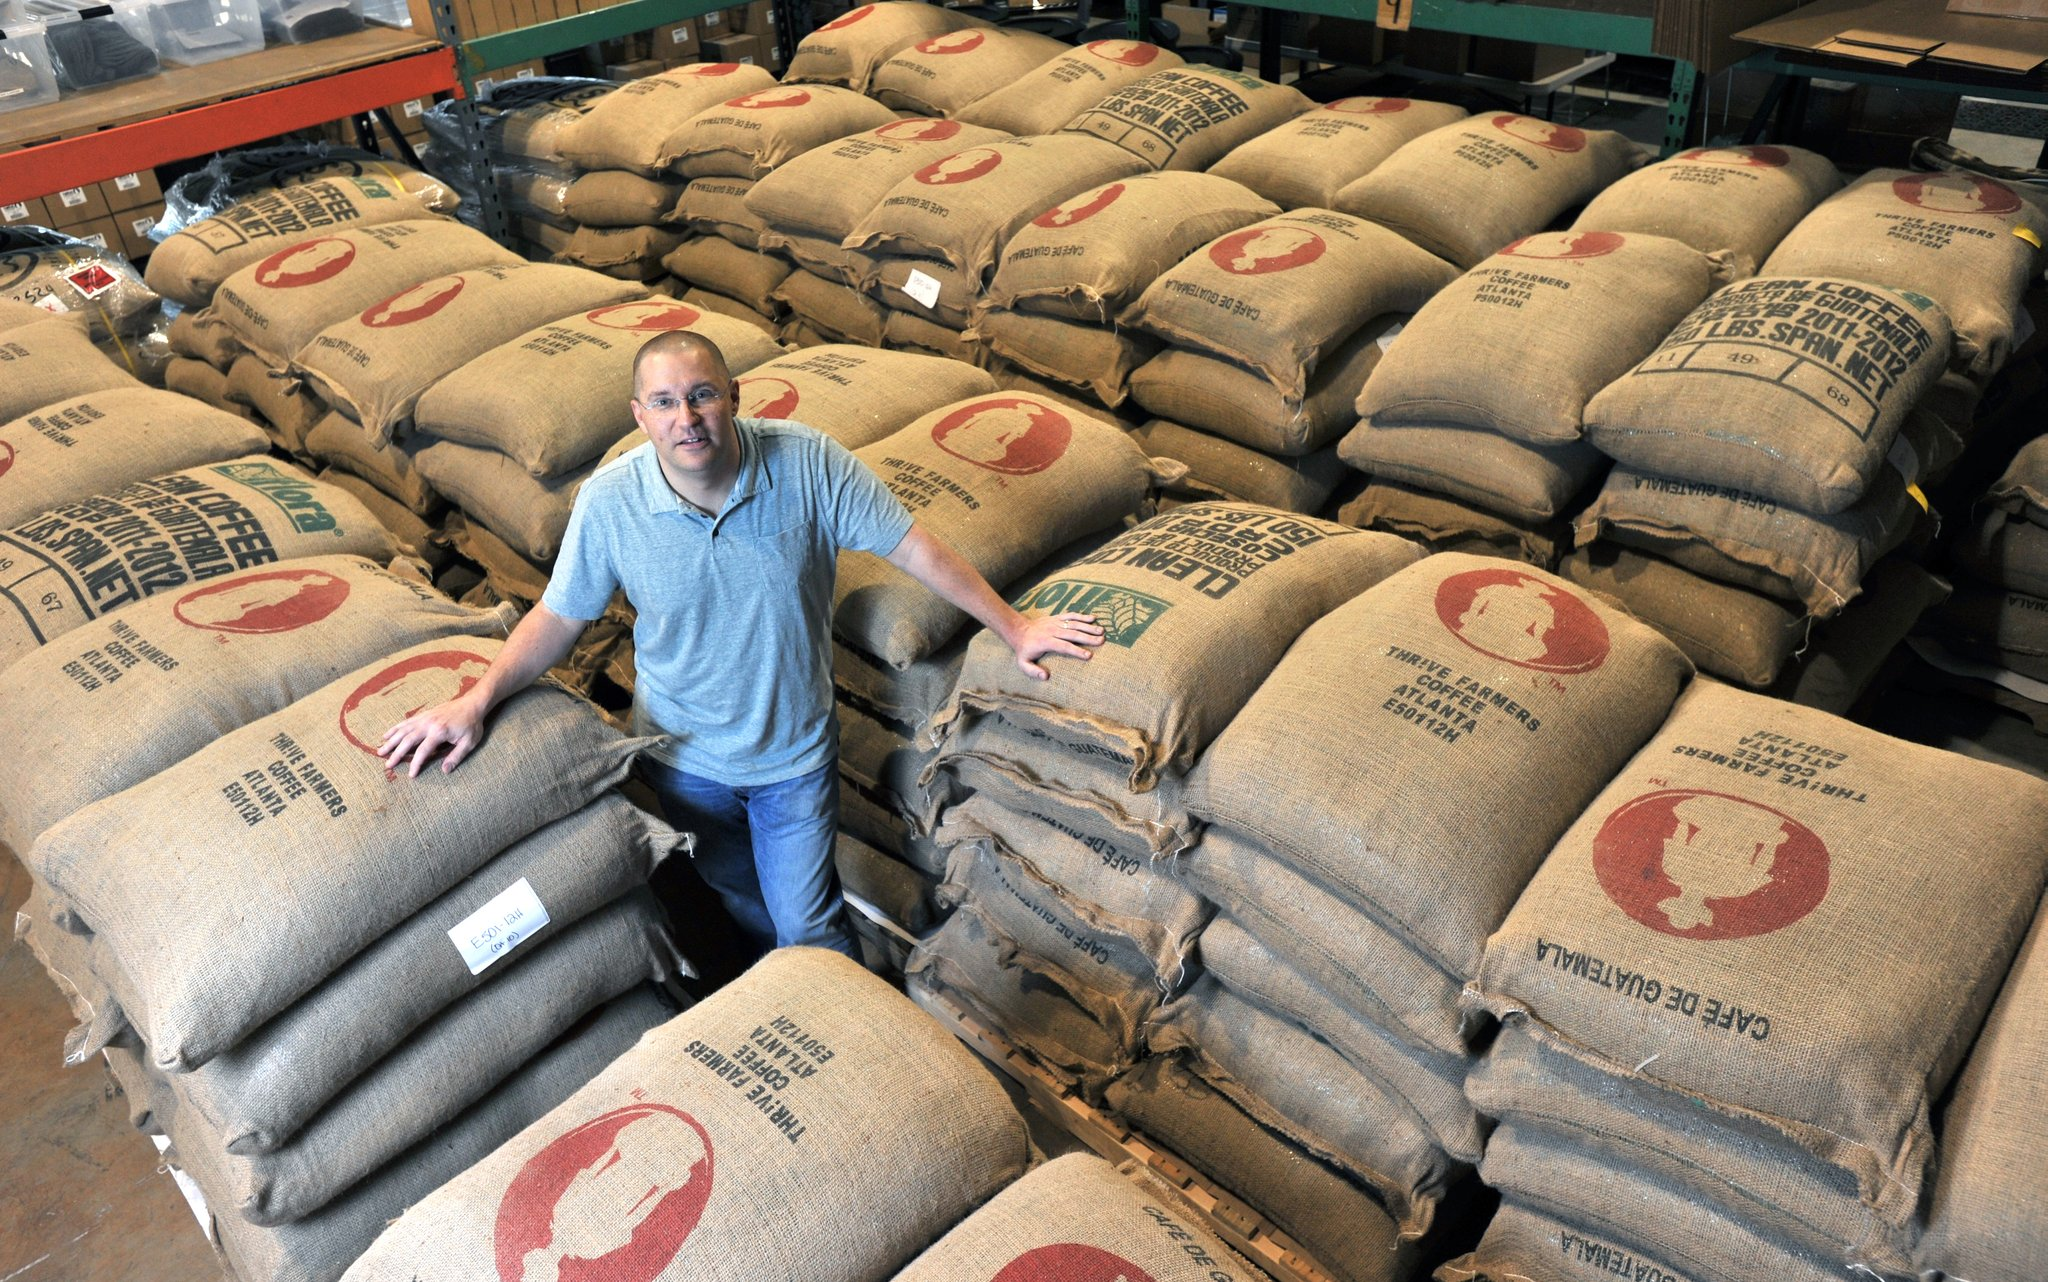 061713-coffee-farmer-HS03.jpg